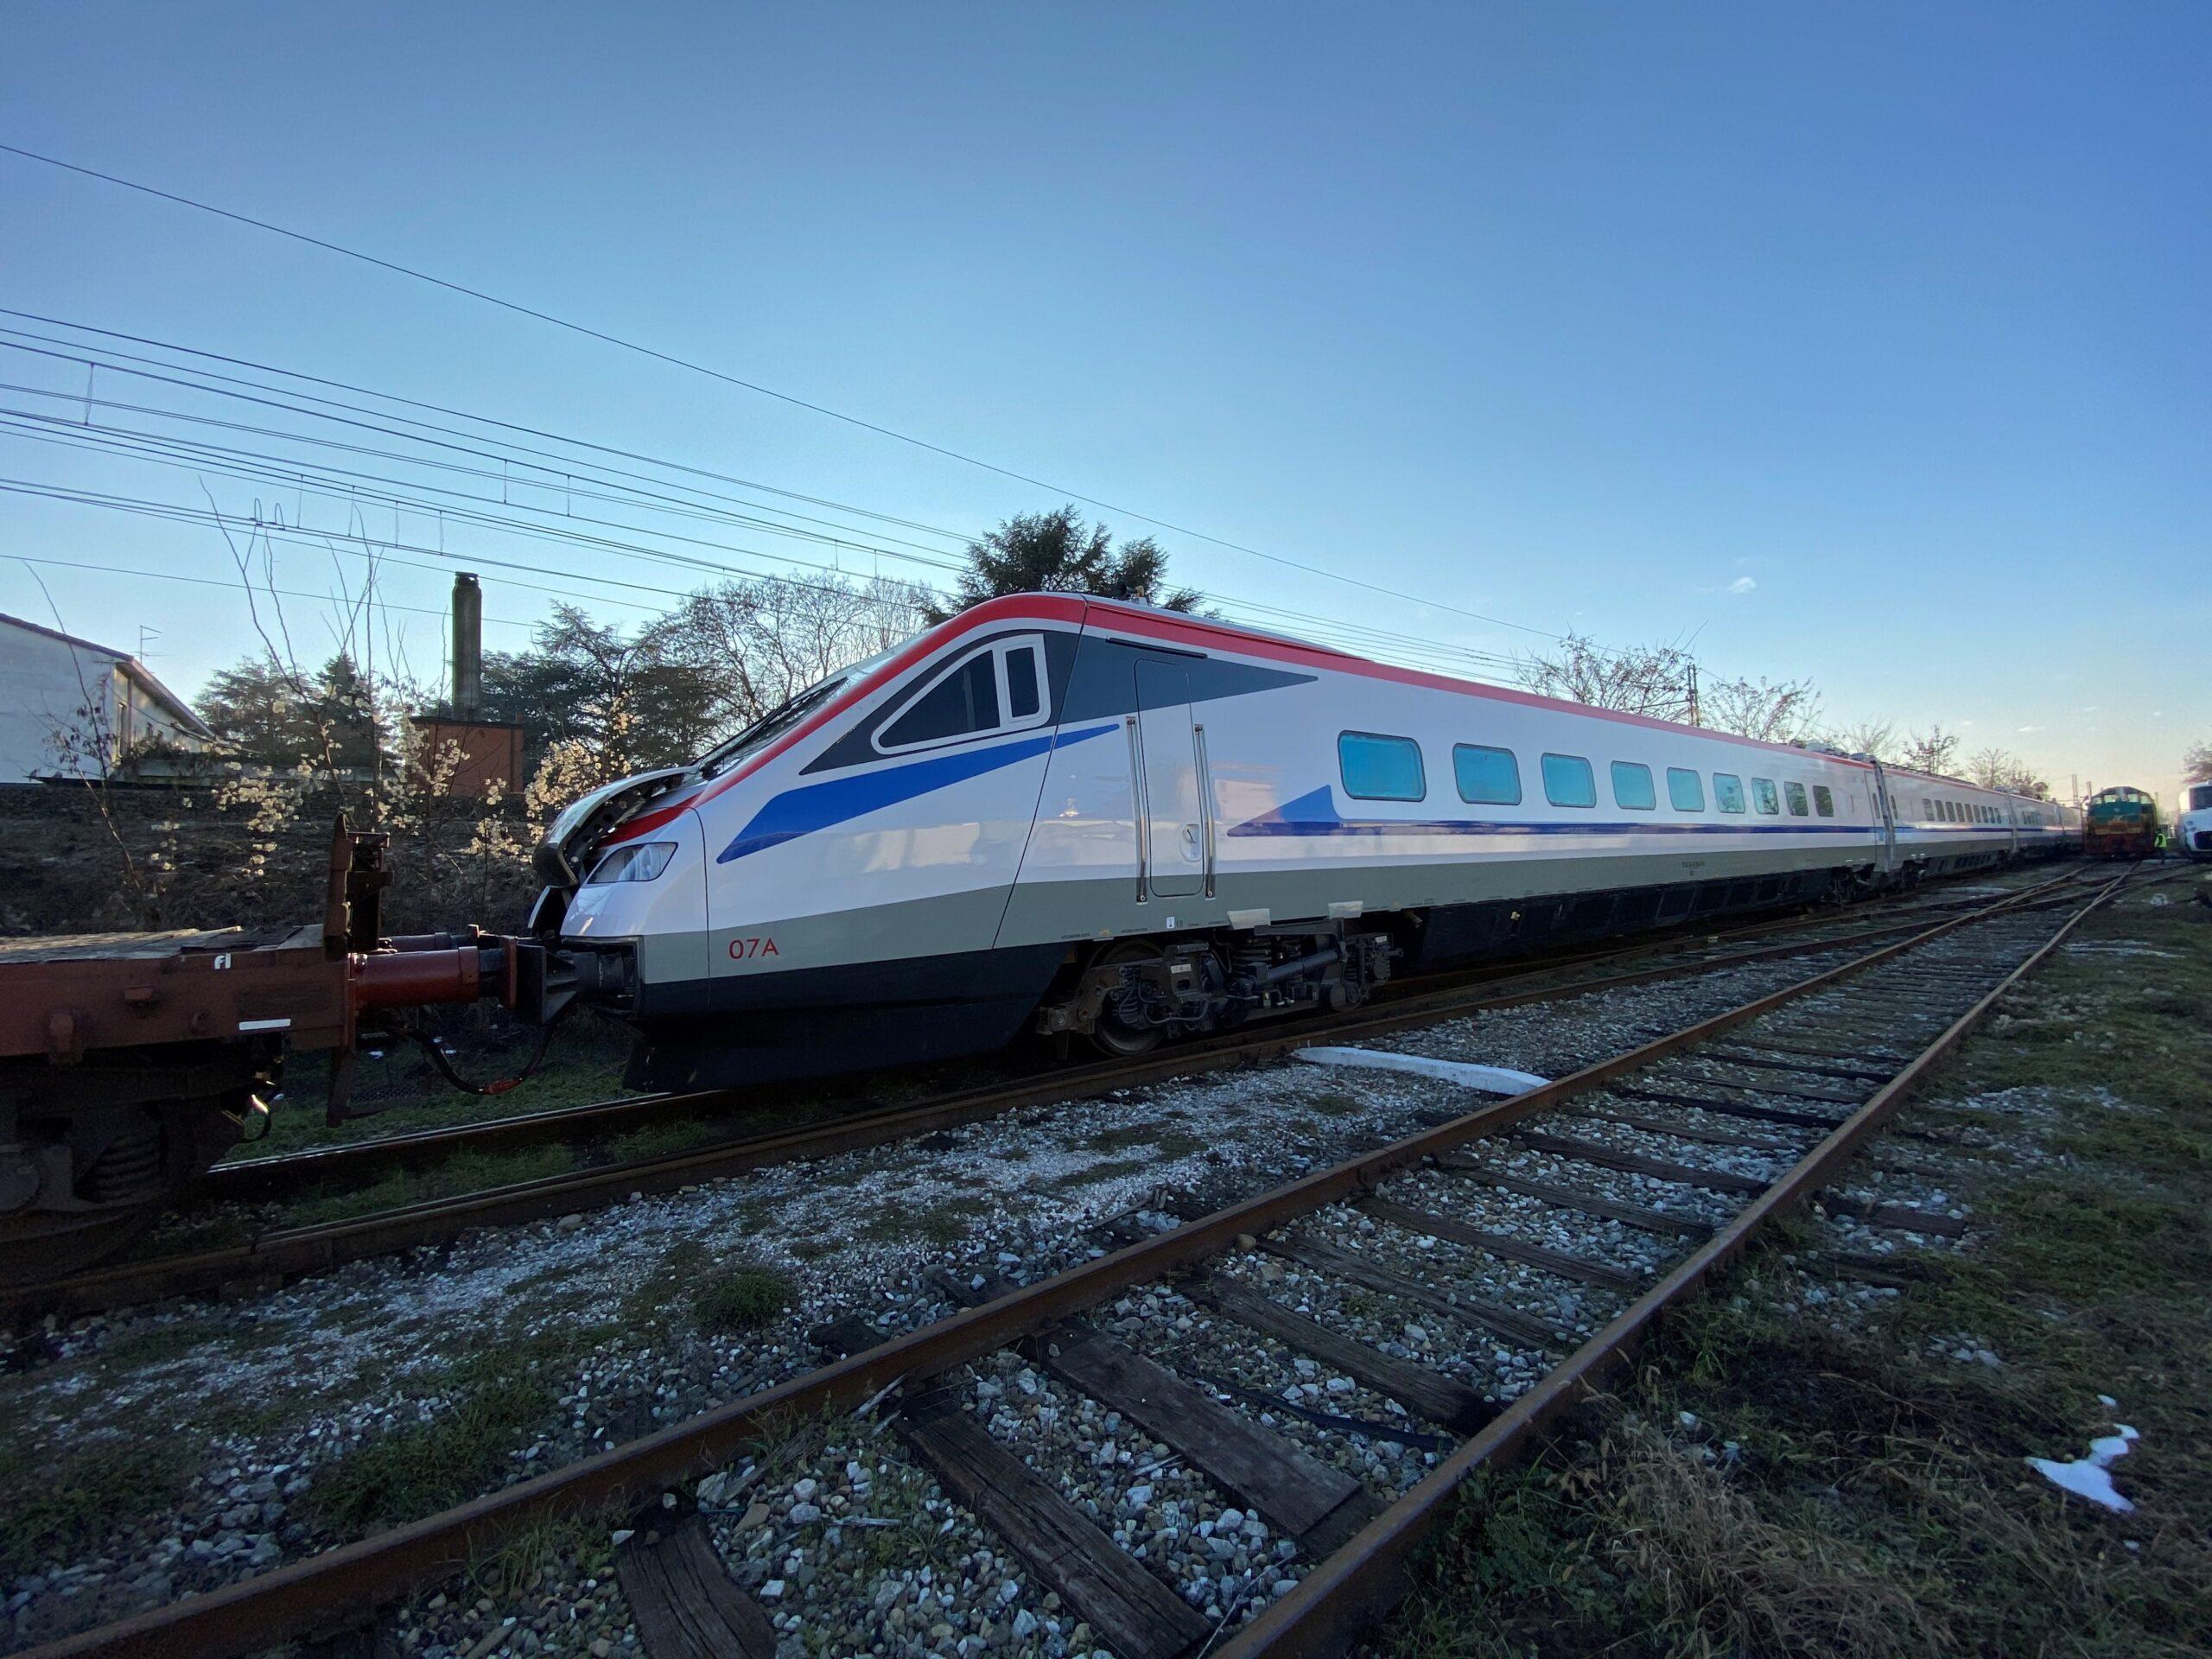 ETR470 Pendolino on its way to Greece